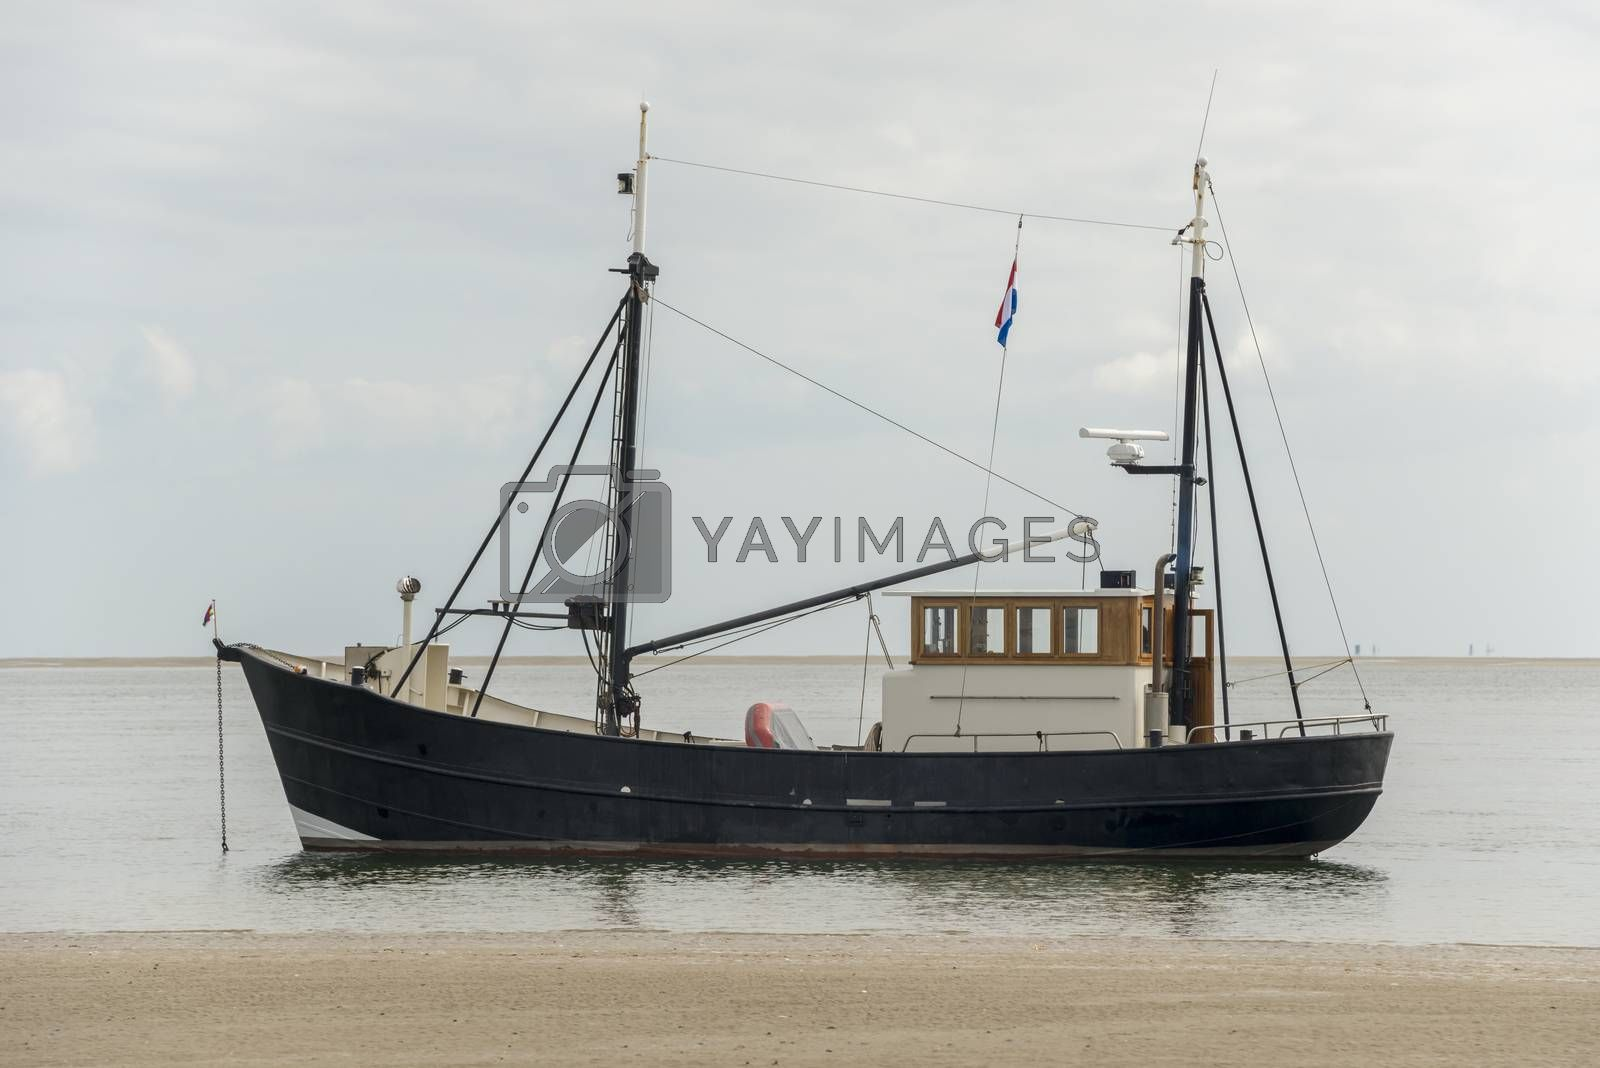 Fishing boat near the beach on the Dutch Wadden Sea